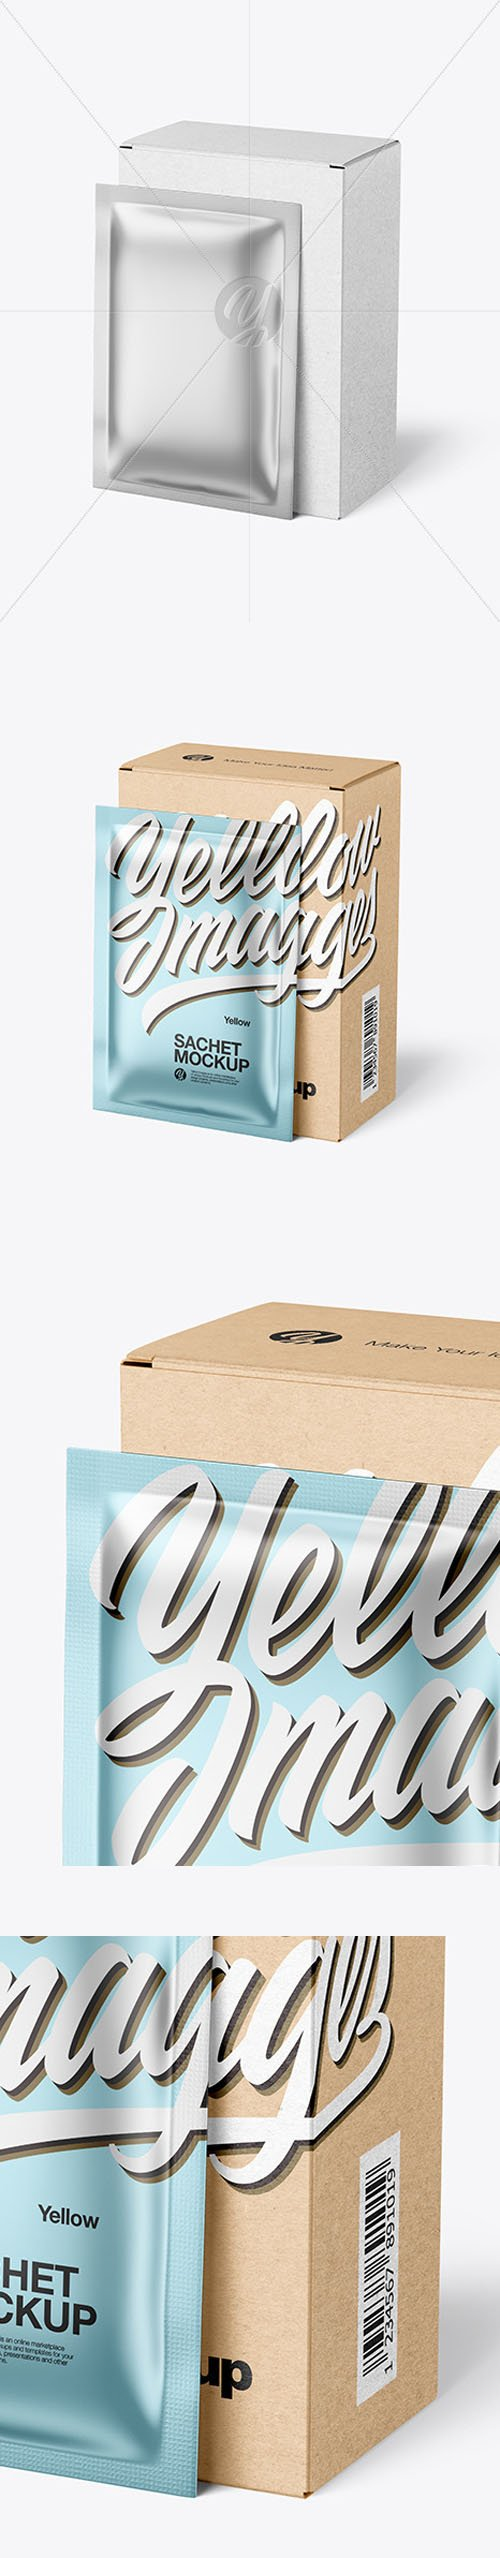 Kraft Paper Box with Metallic Sachet Mockup 46470